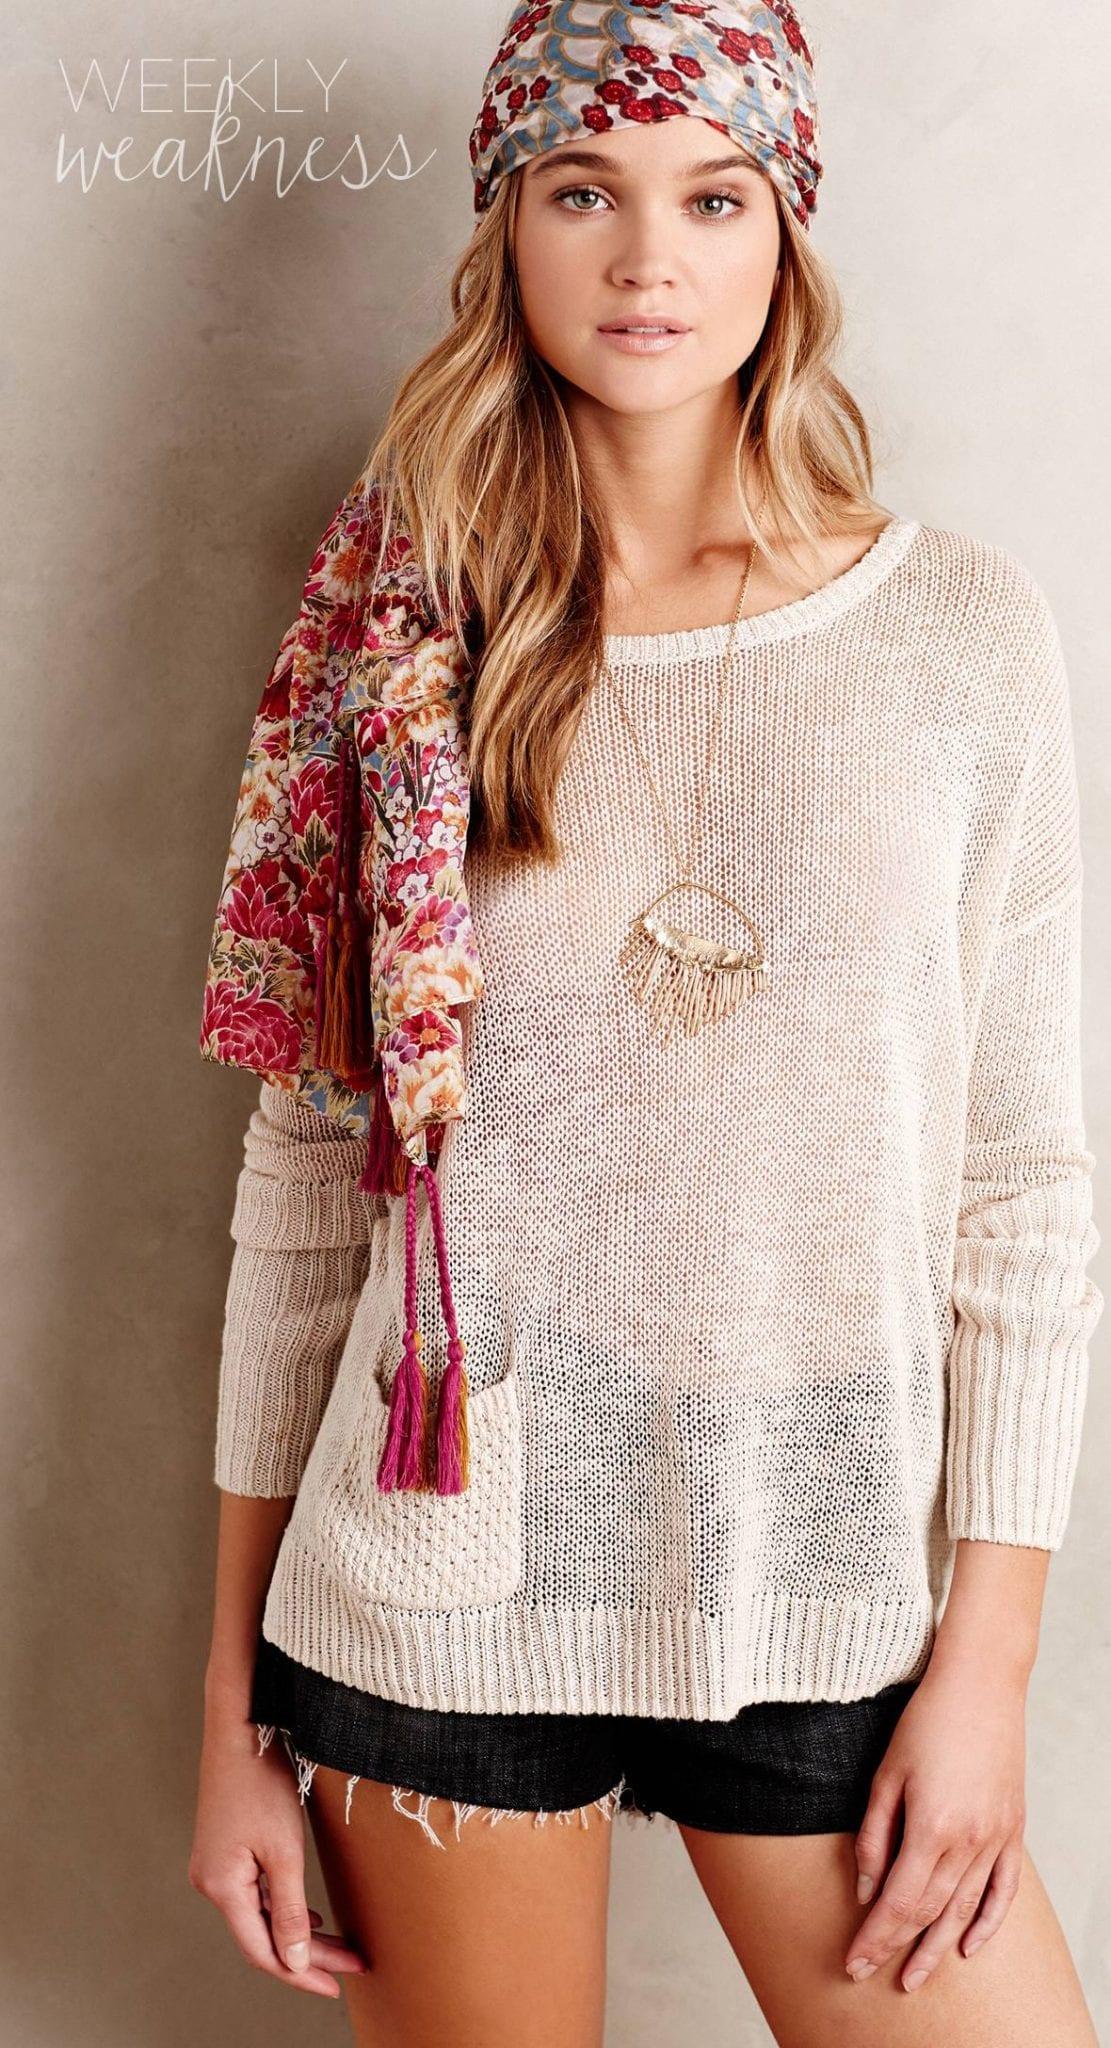 Poor Little It Girl Weekly Weakness - Anthropologie Sweater and Shorts - @poorlilitgirl